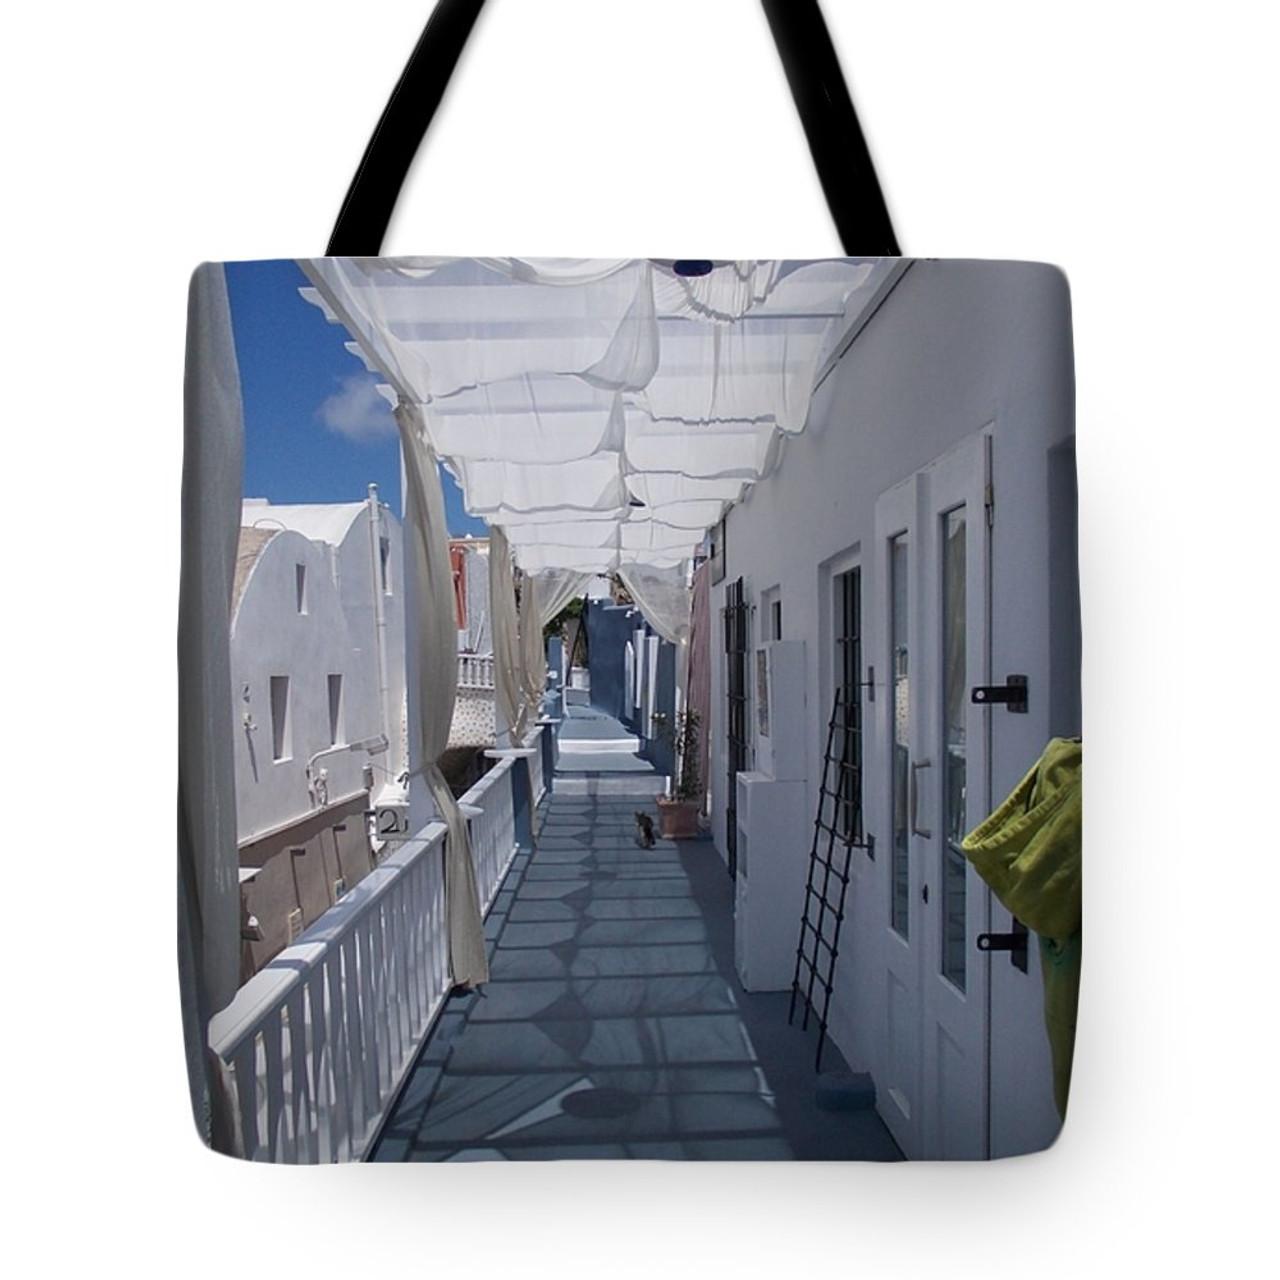 Santorini Tote bag- purchase here.